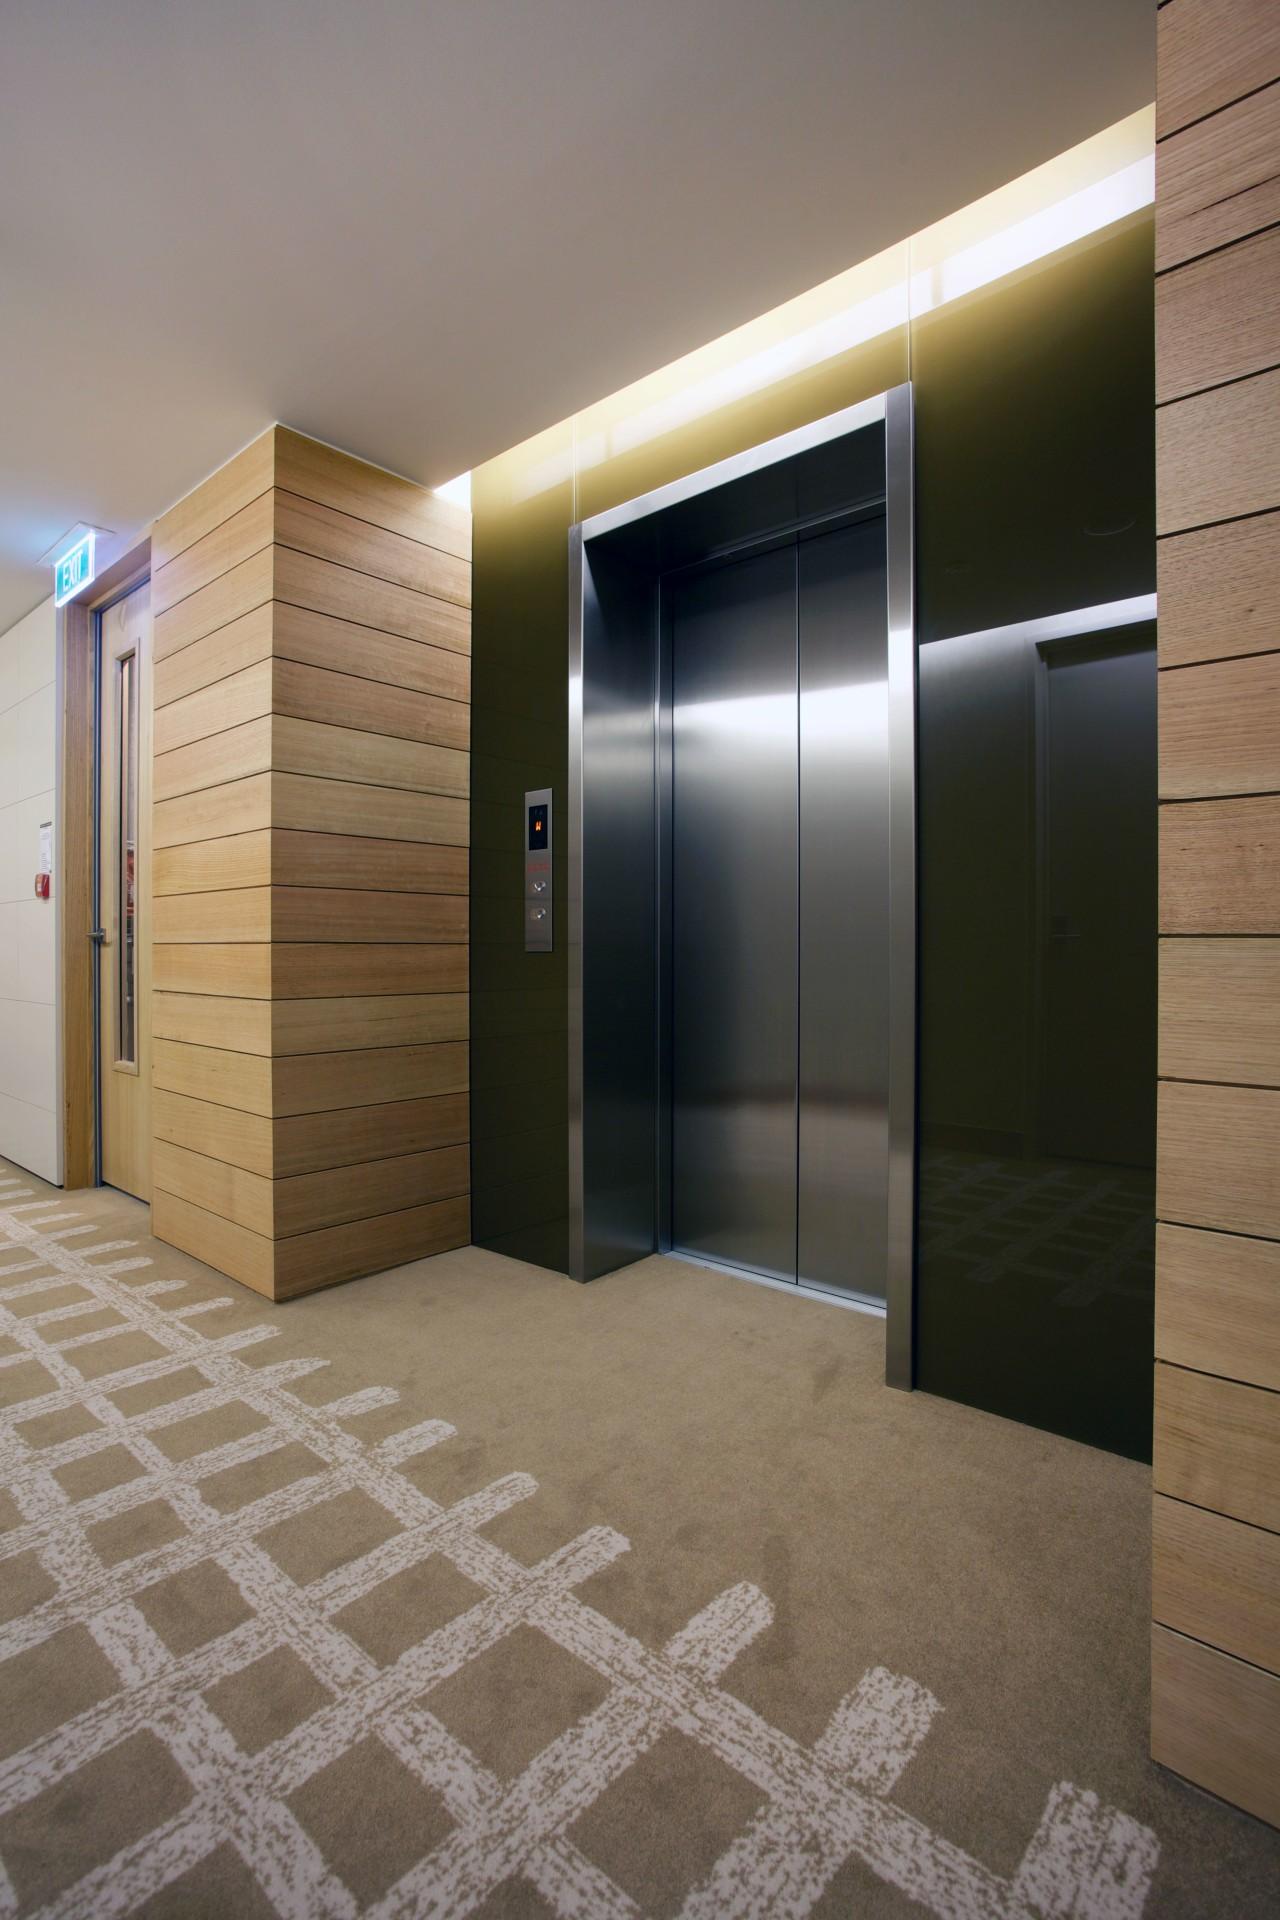 Otis Elevators supplied and maintains nine Otis Gen2 architecture, floor, flooring, interior design, lobby, real estate, brown, gray